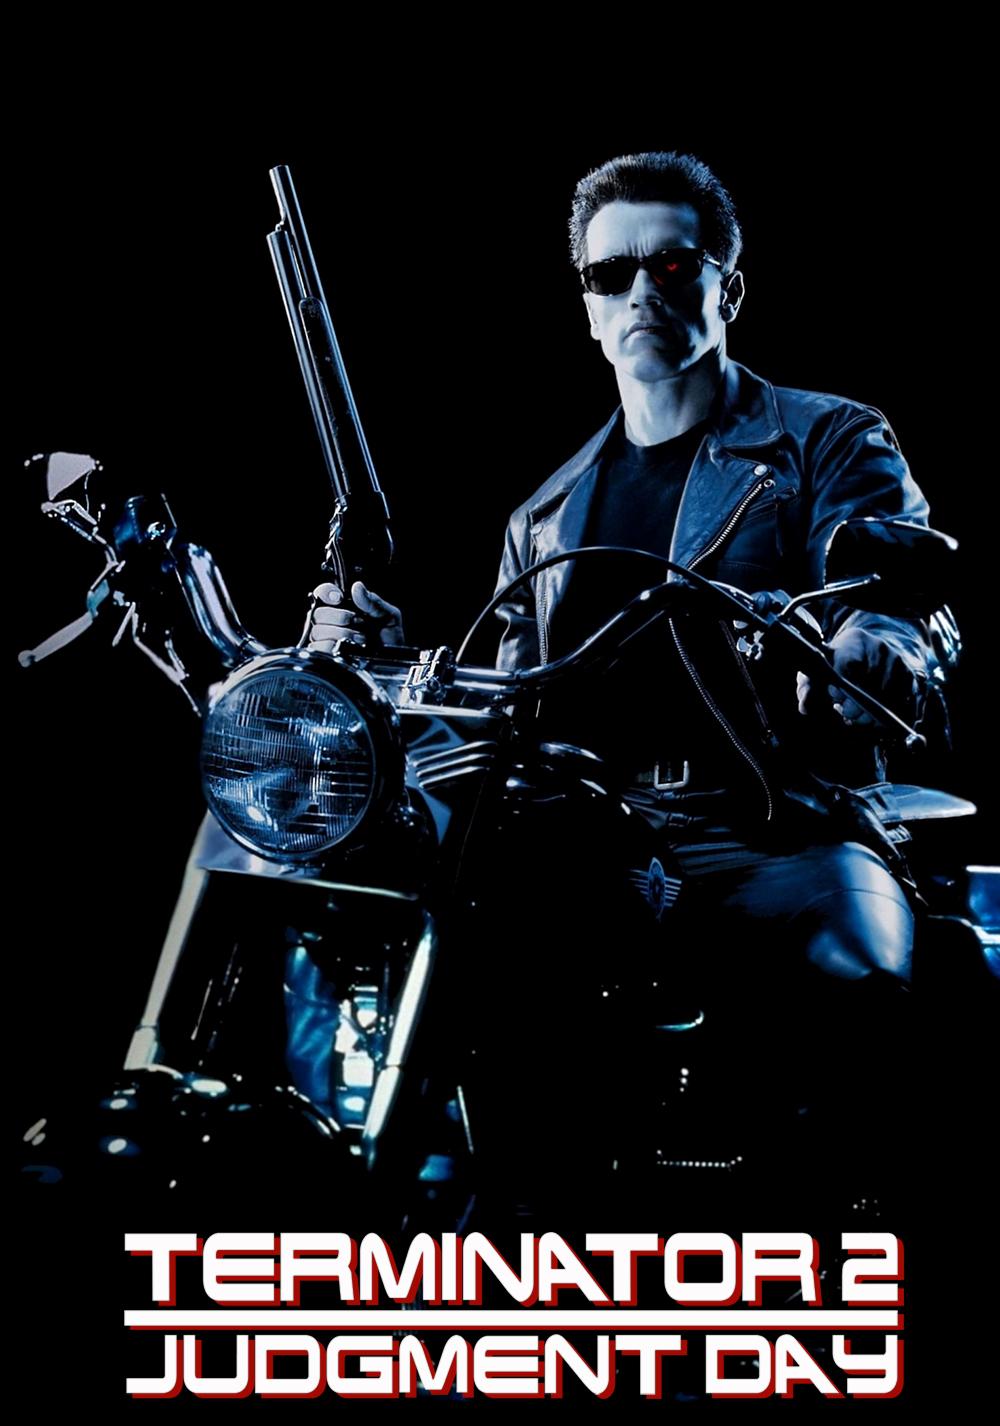 terminator 2 Terminator 2: judgment day 3d in us theaters july 3, 1991 starring arnold schwarzenegger, linda hamilton, edward furlong, robert patrick arnold schwarzenegger.